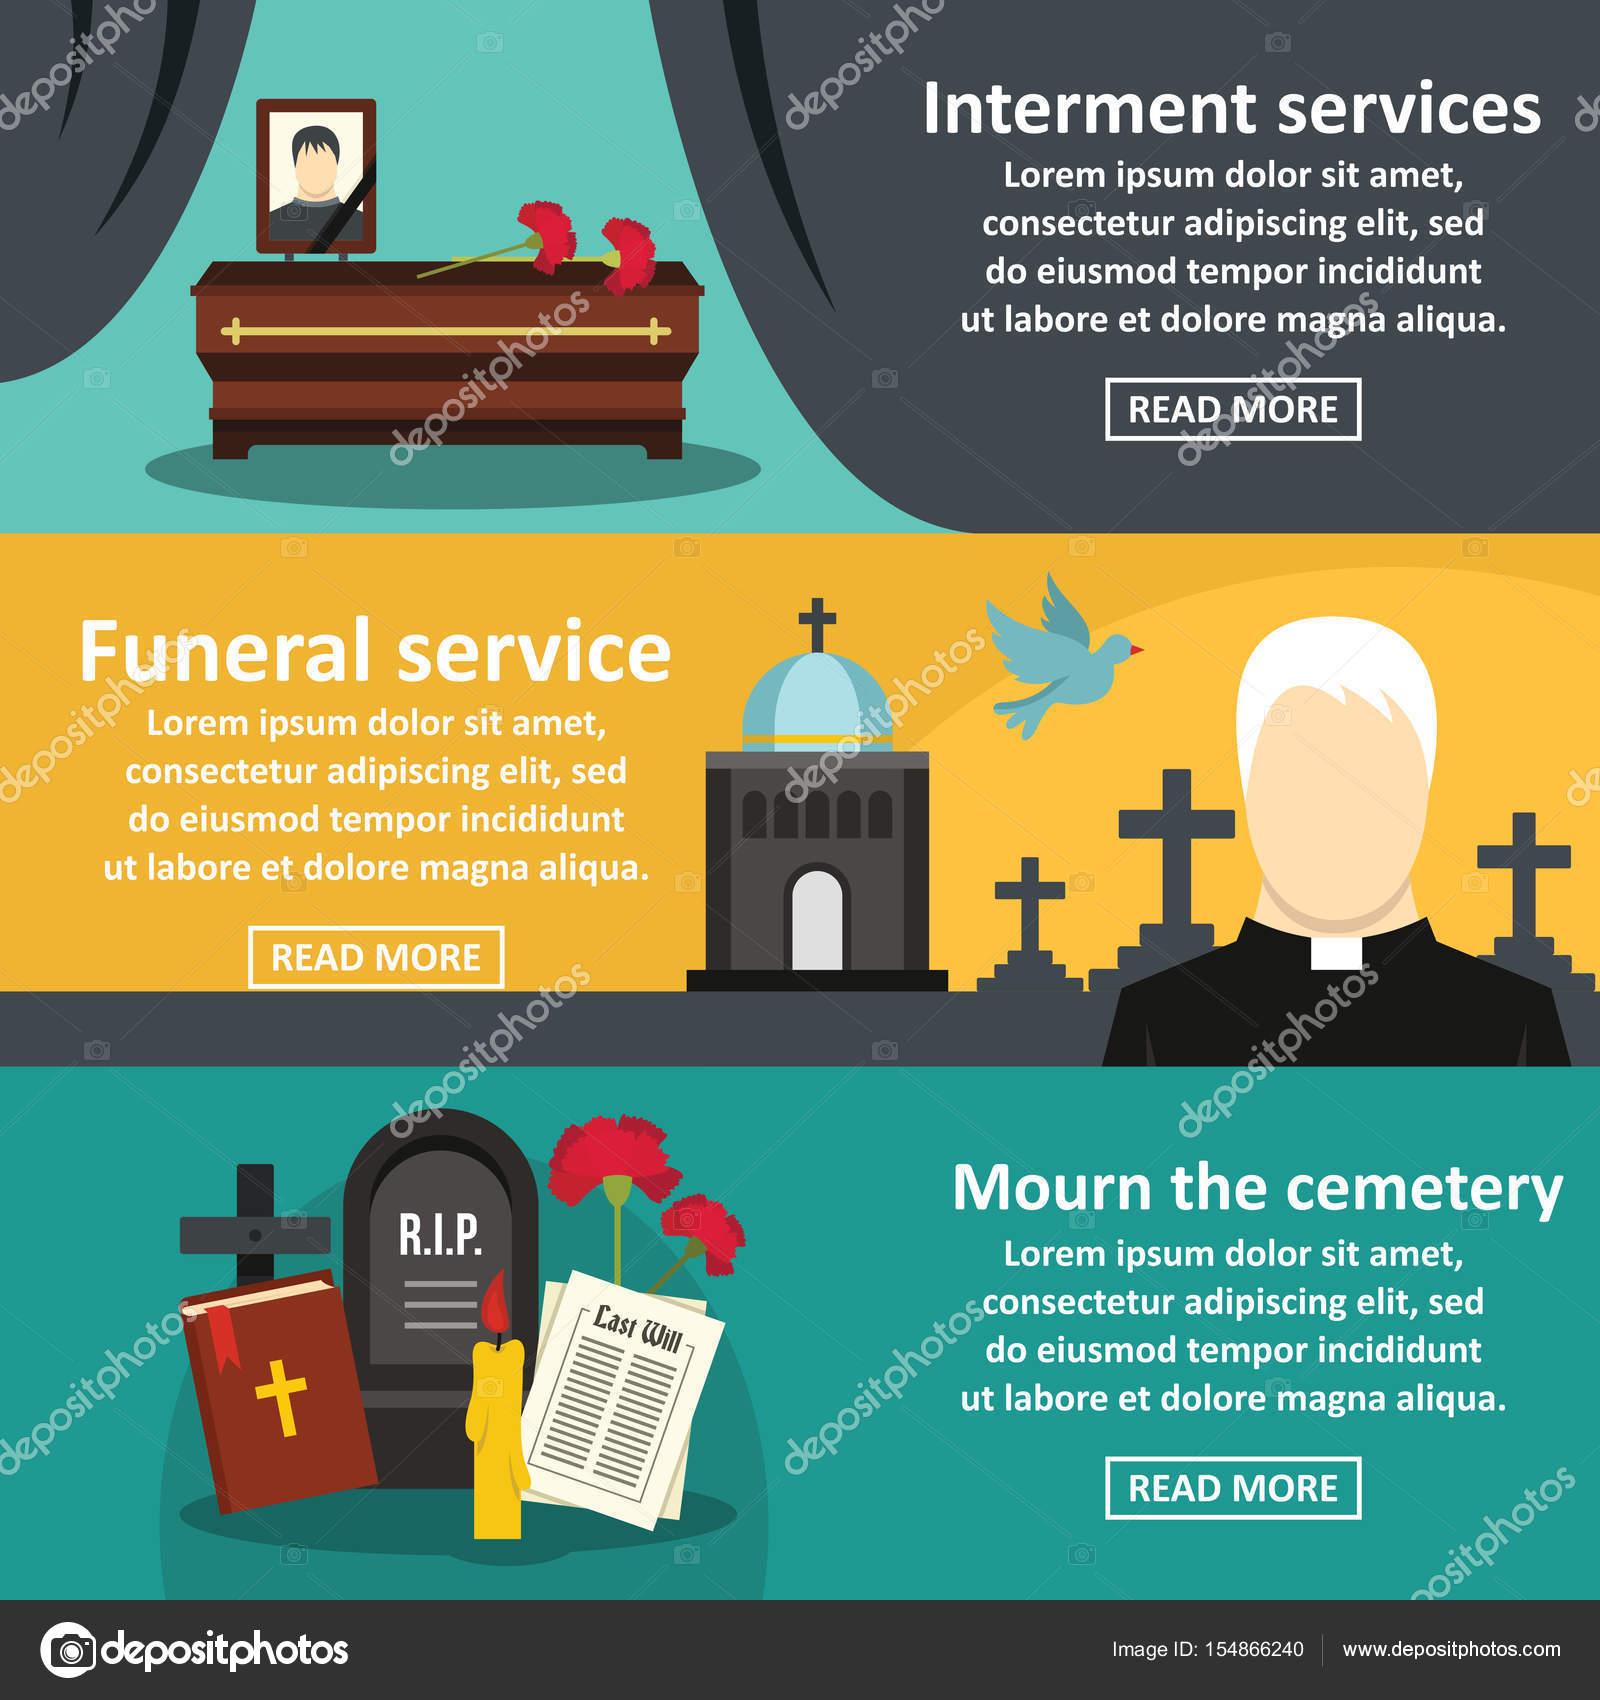 Funeraria servicio banner horizontal sistema, plano estilo — Archivo ...